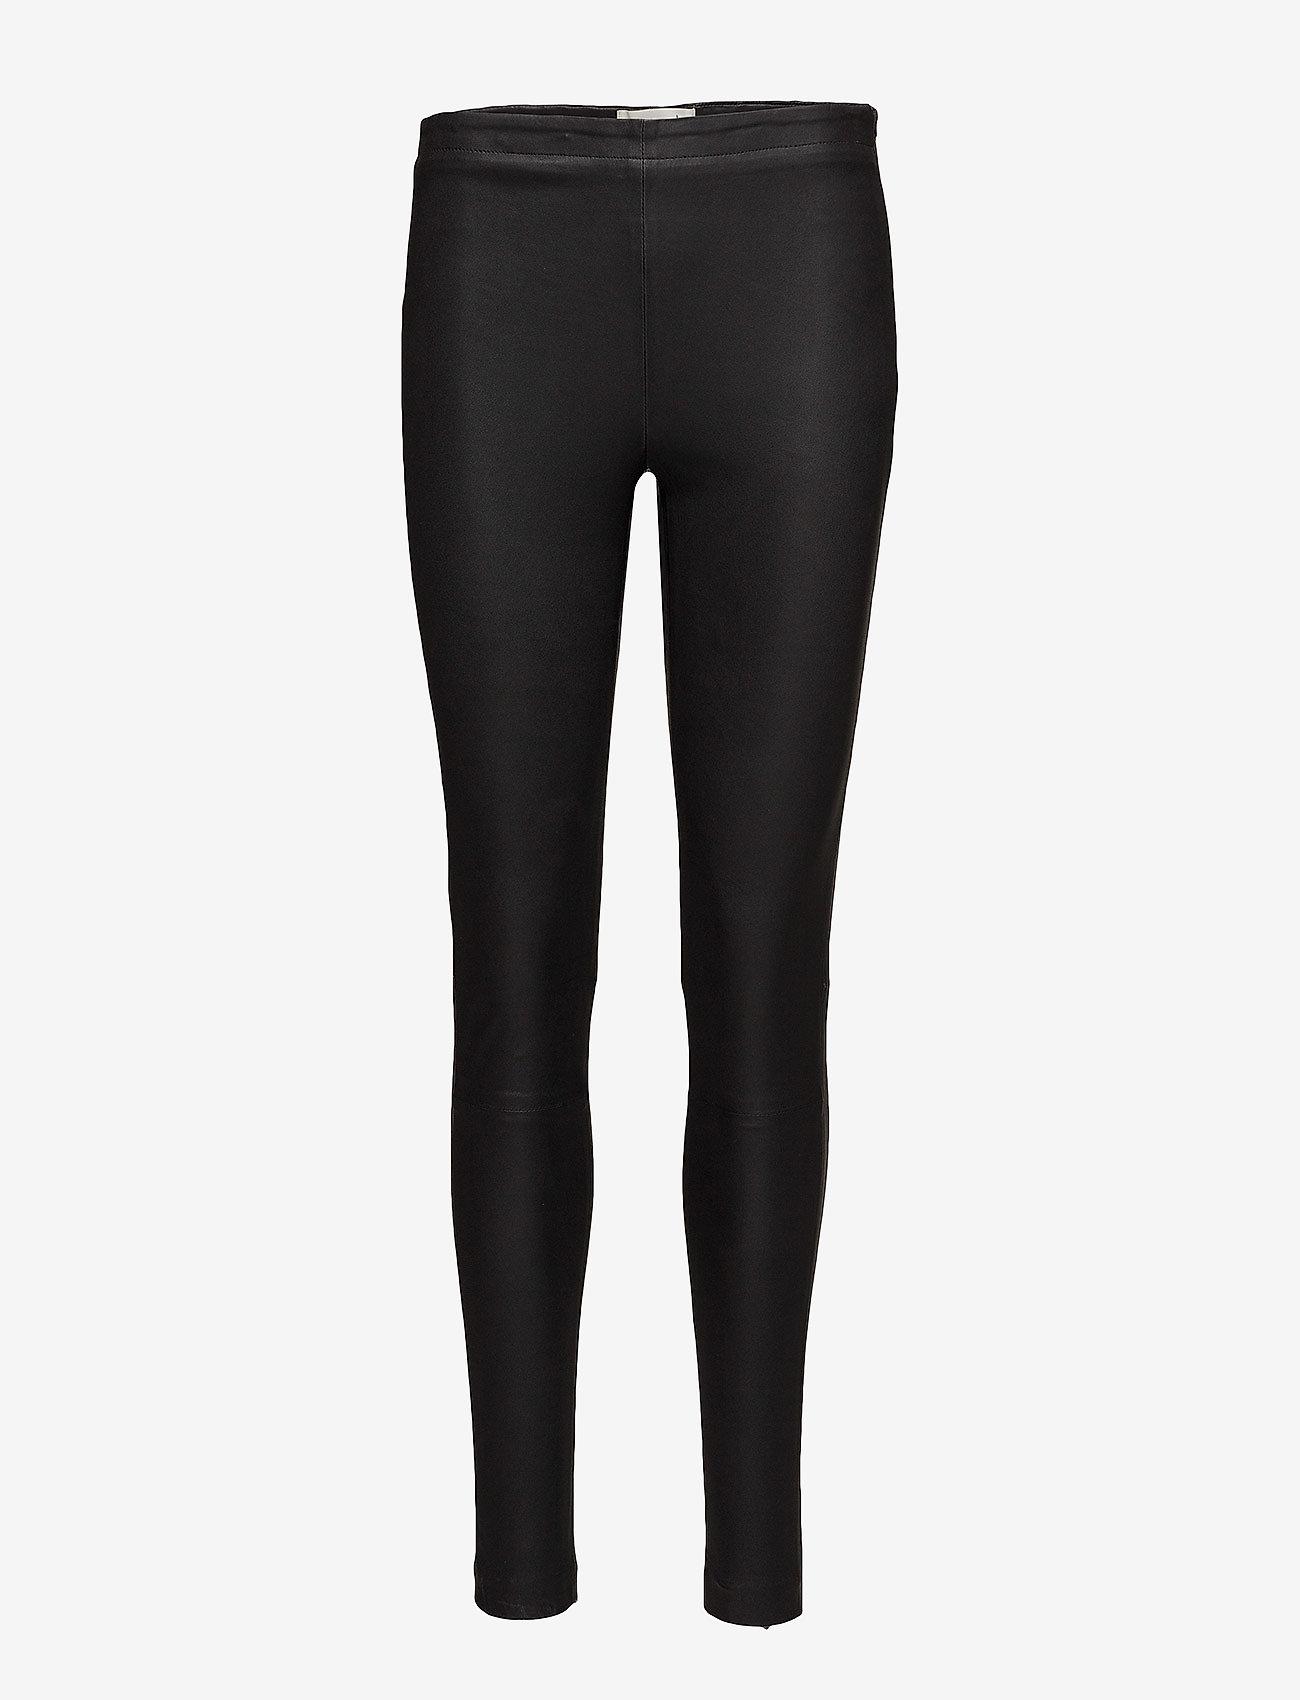 Rosemunde - Trousers - broeken med skinny fit - black - 0